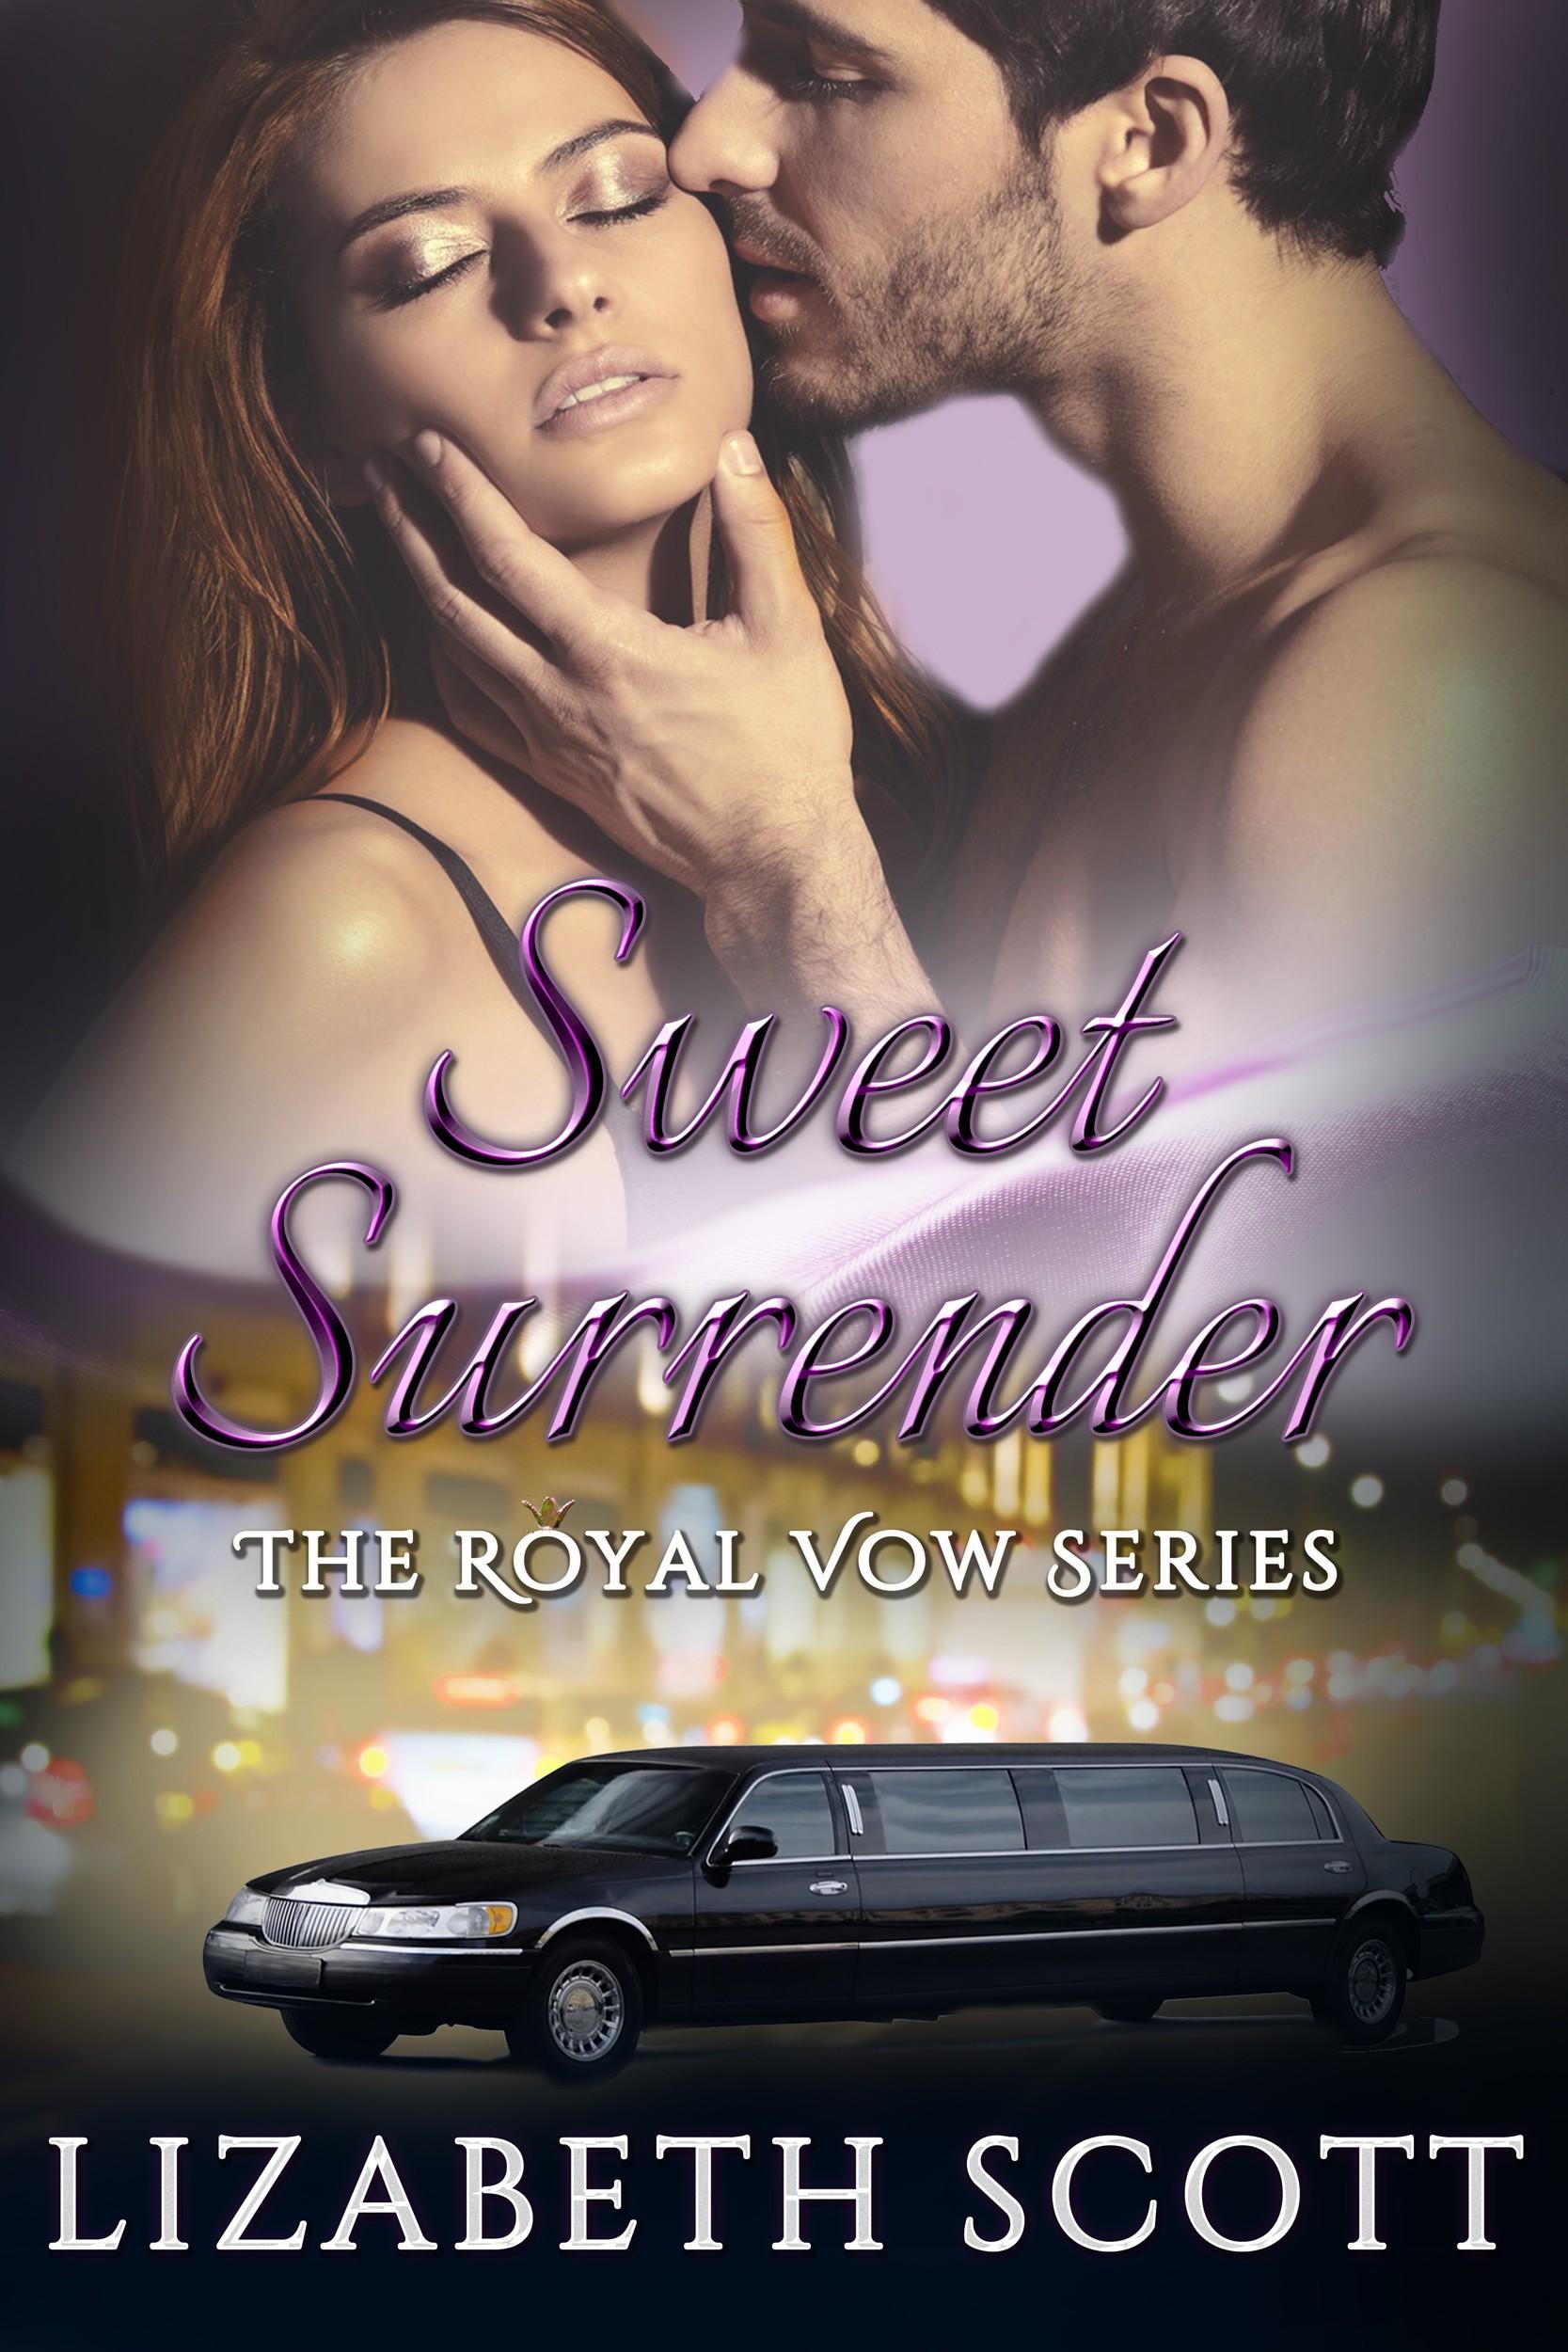 Sweet Surrender, Royal Vow Series, Contemporary Romance, Lizabeth Scott